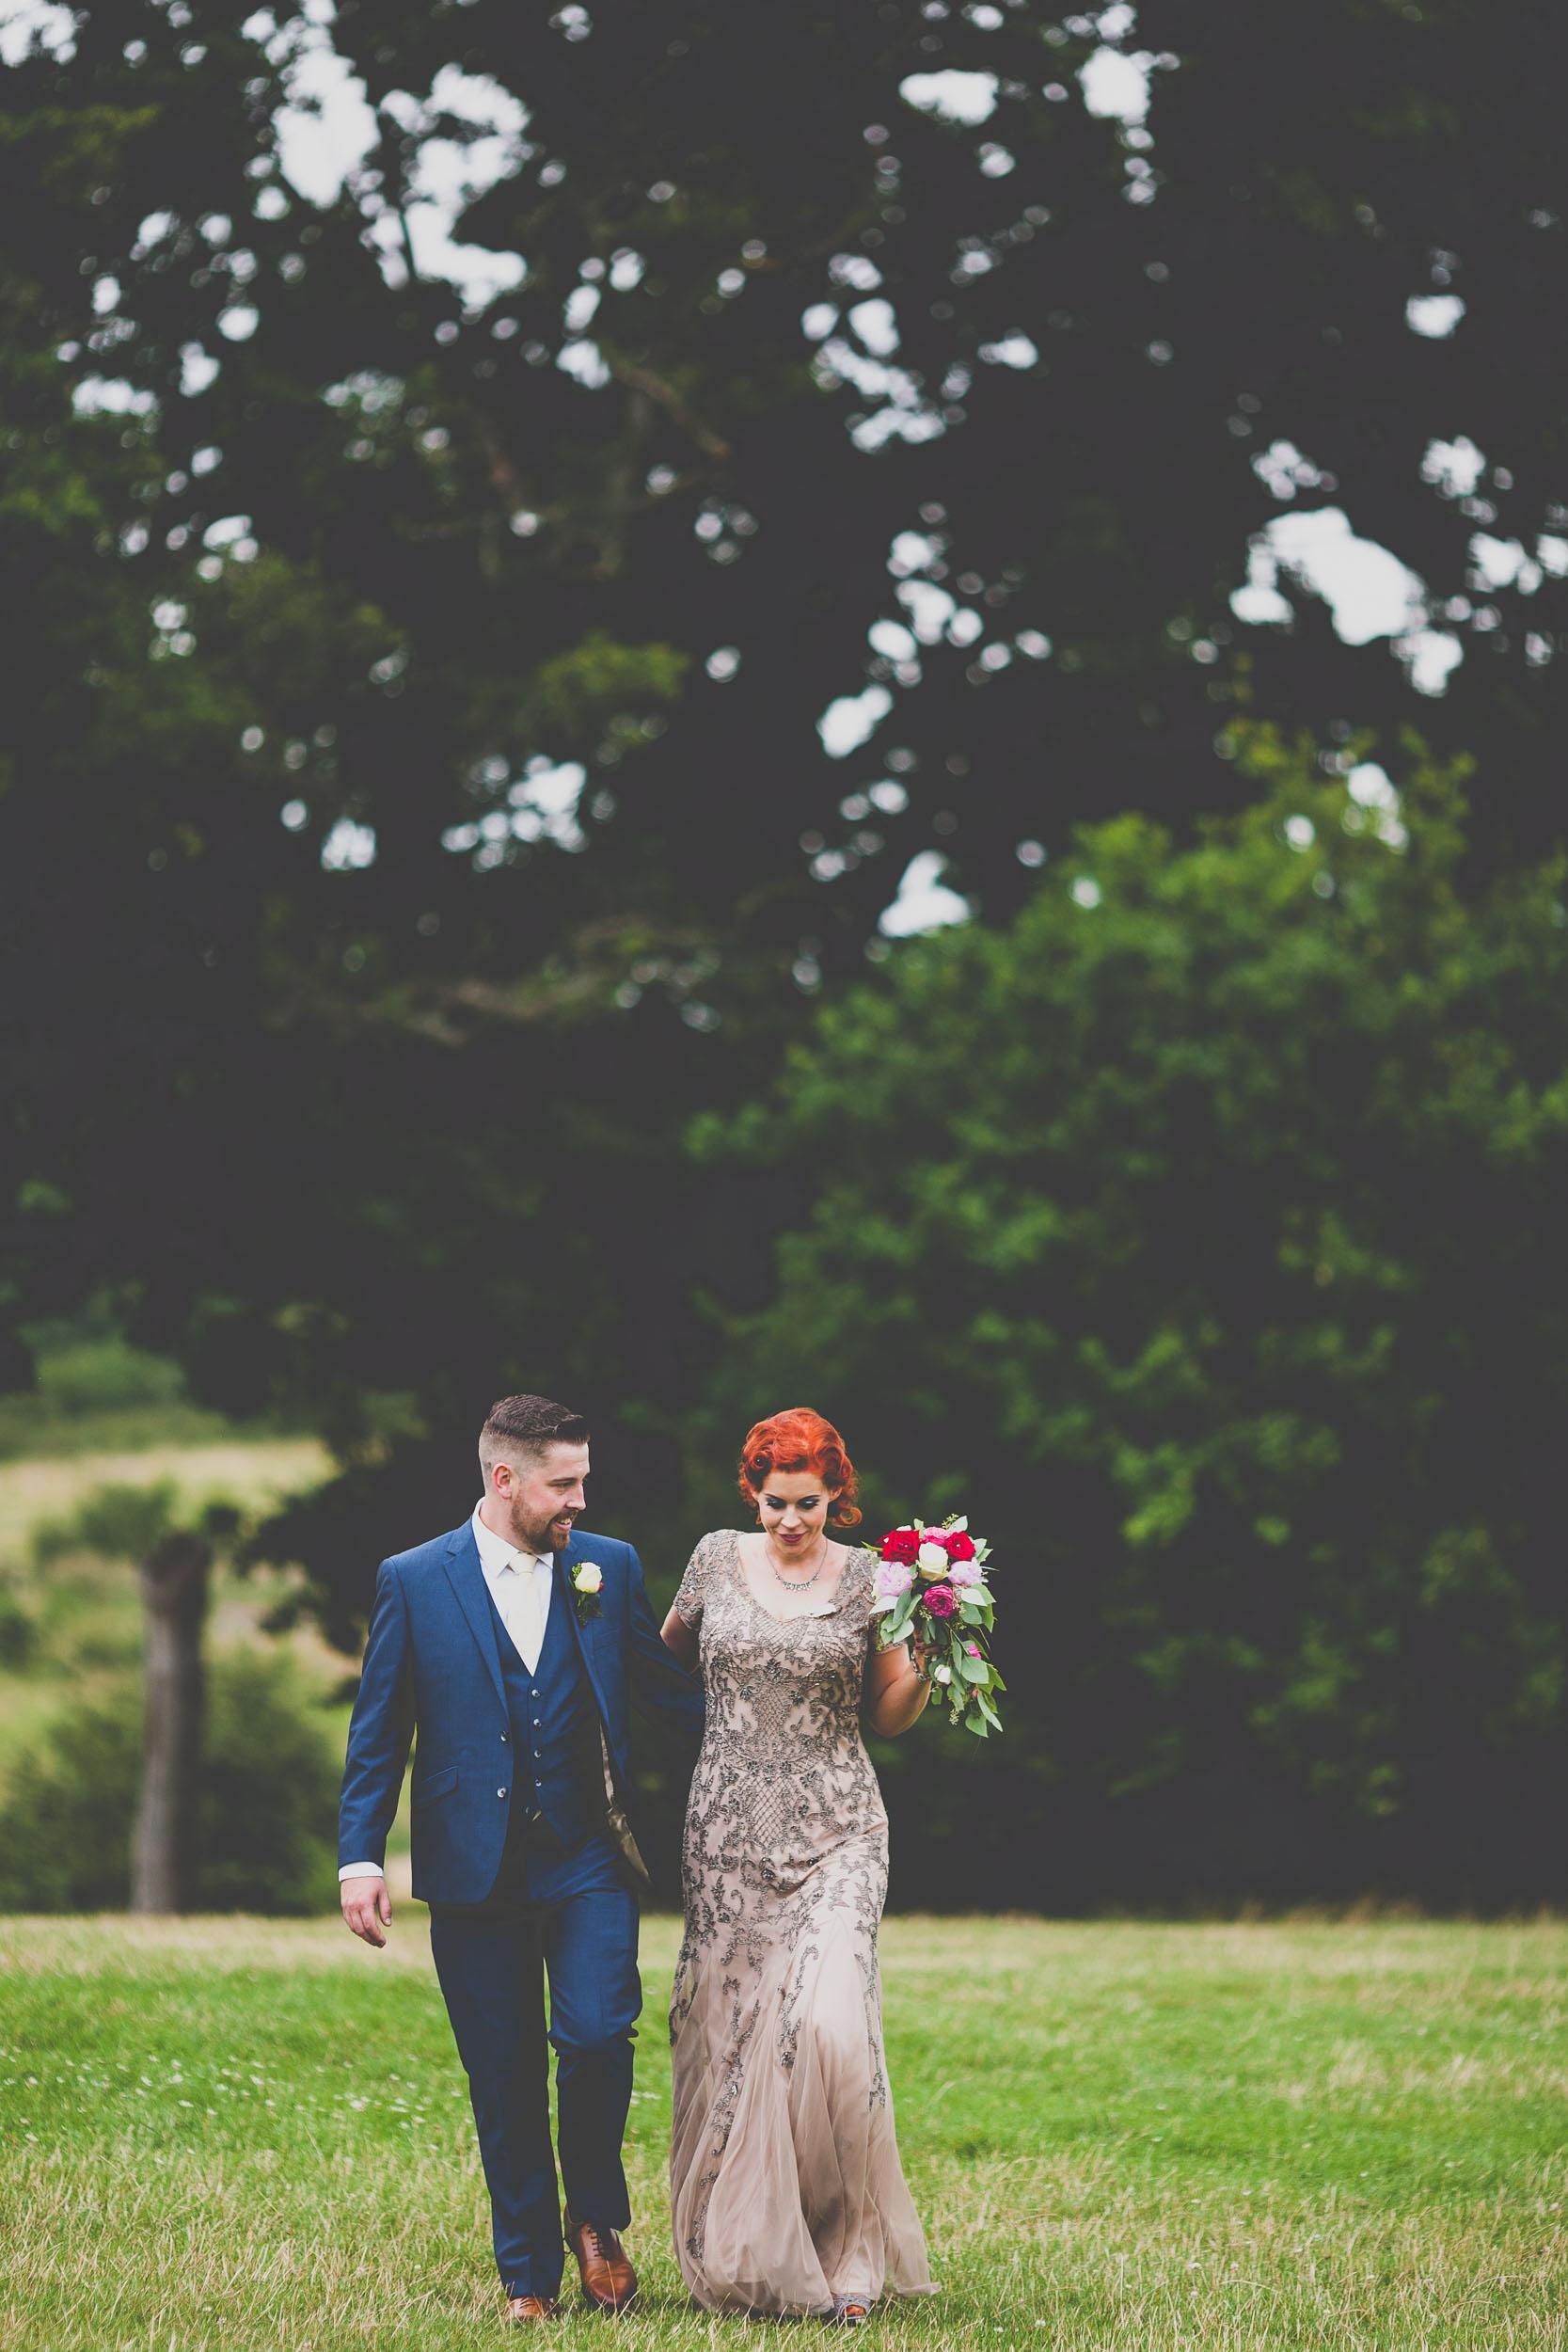 queen-elizabeths-hunting-lodge-epping-forest-wedding201.jpg